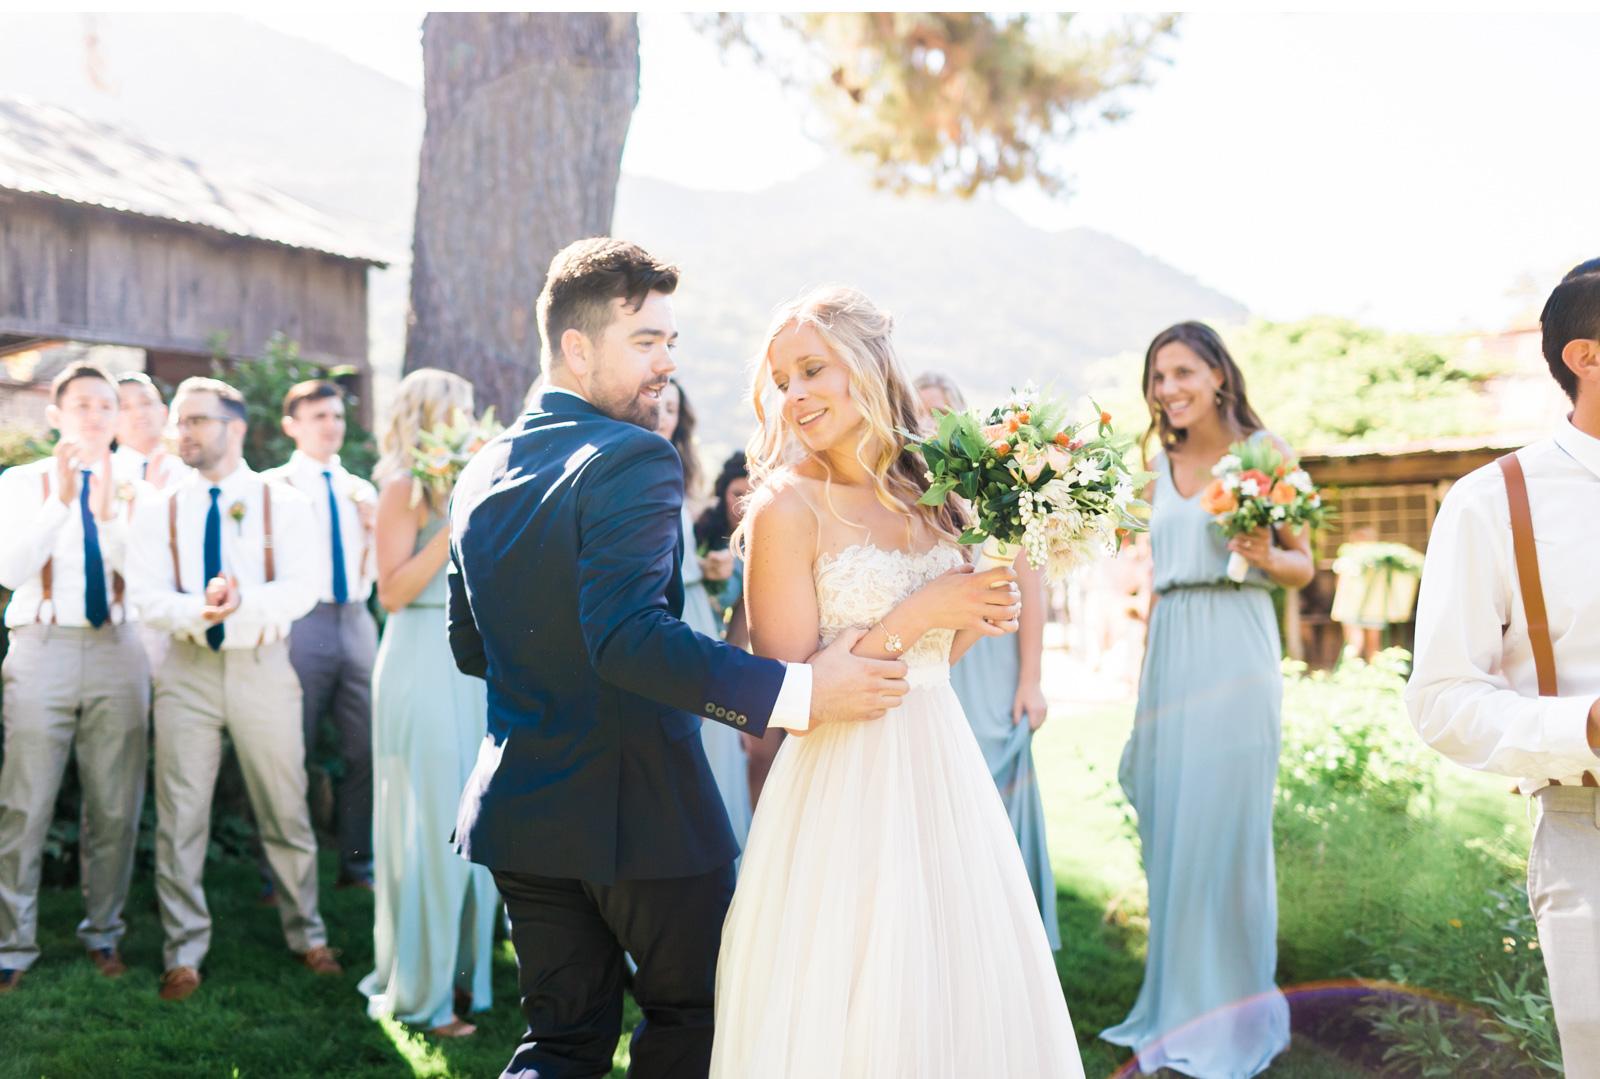 Sea-Canyon-Fruit-Ranch-Wedding-Natalie-Schutt-Photography_05.jpg